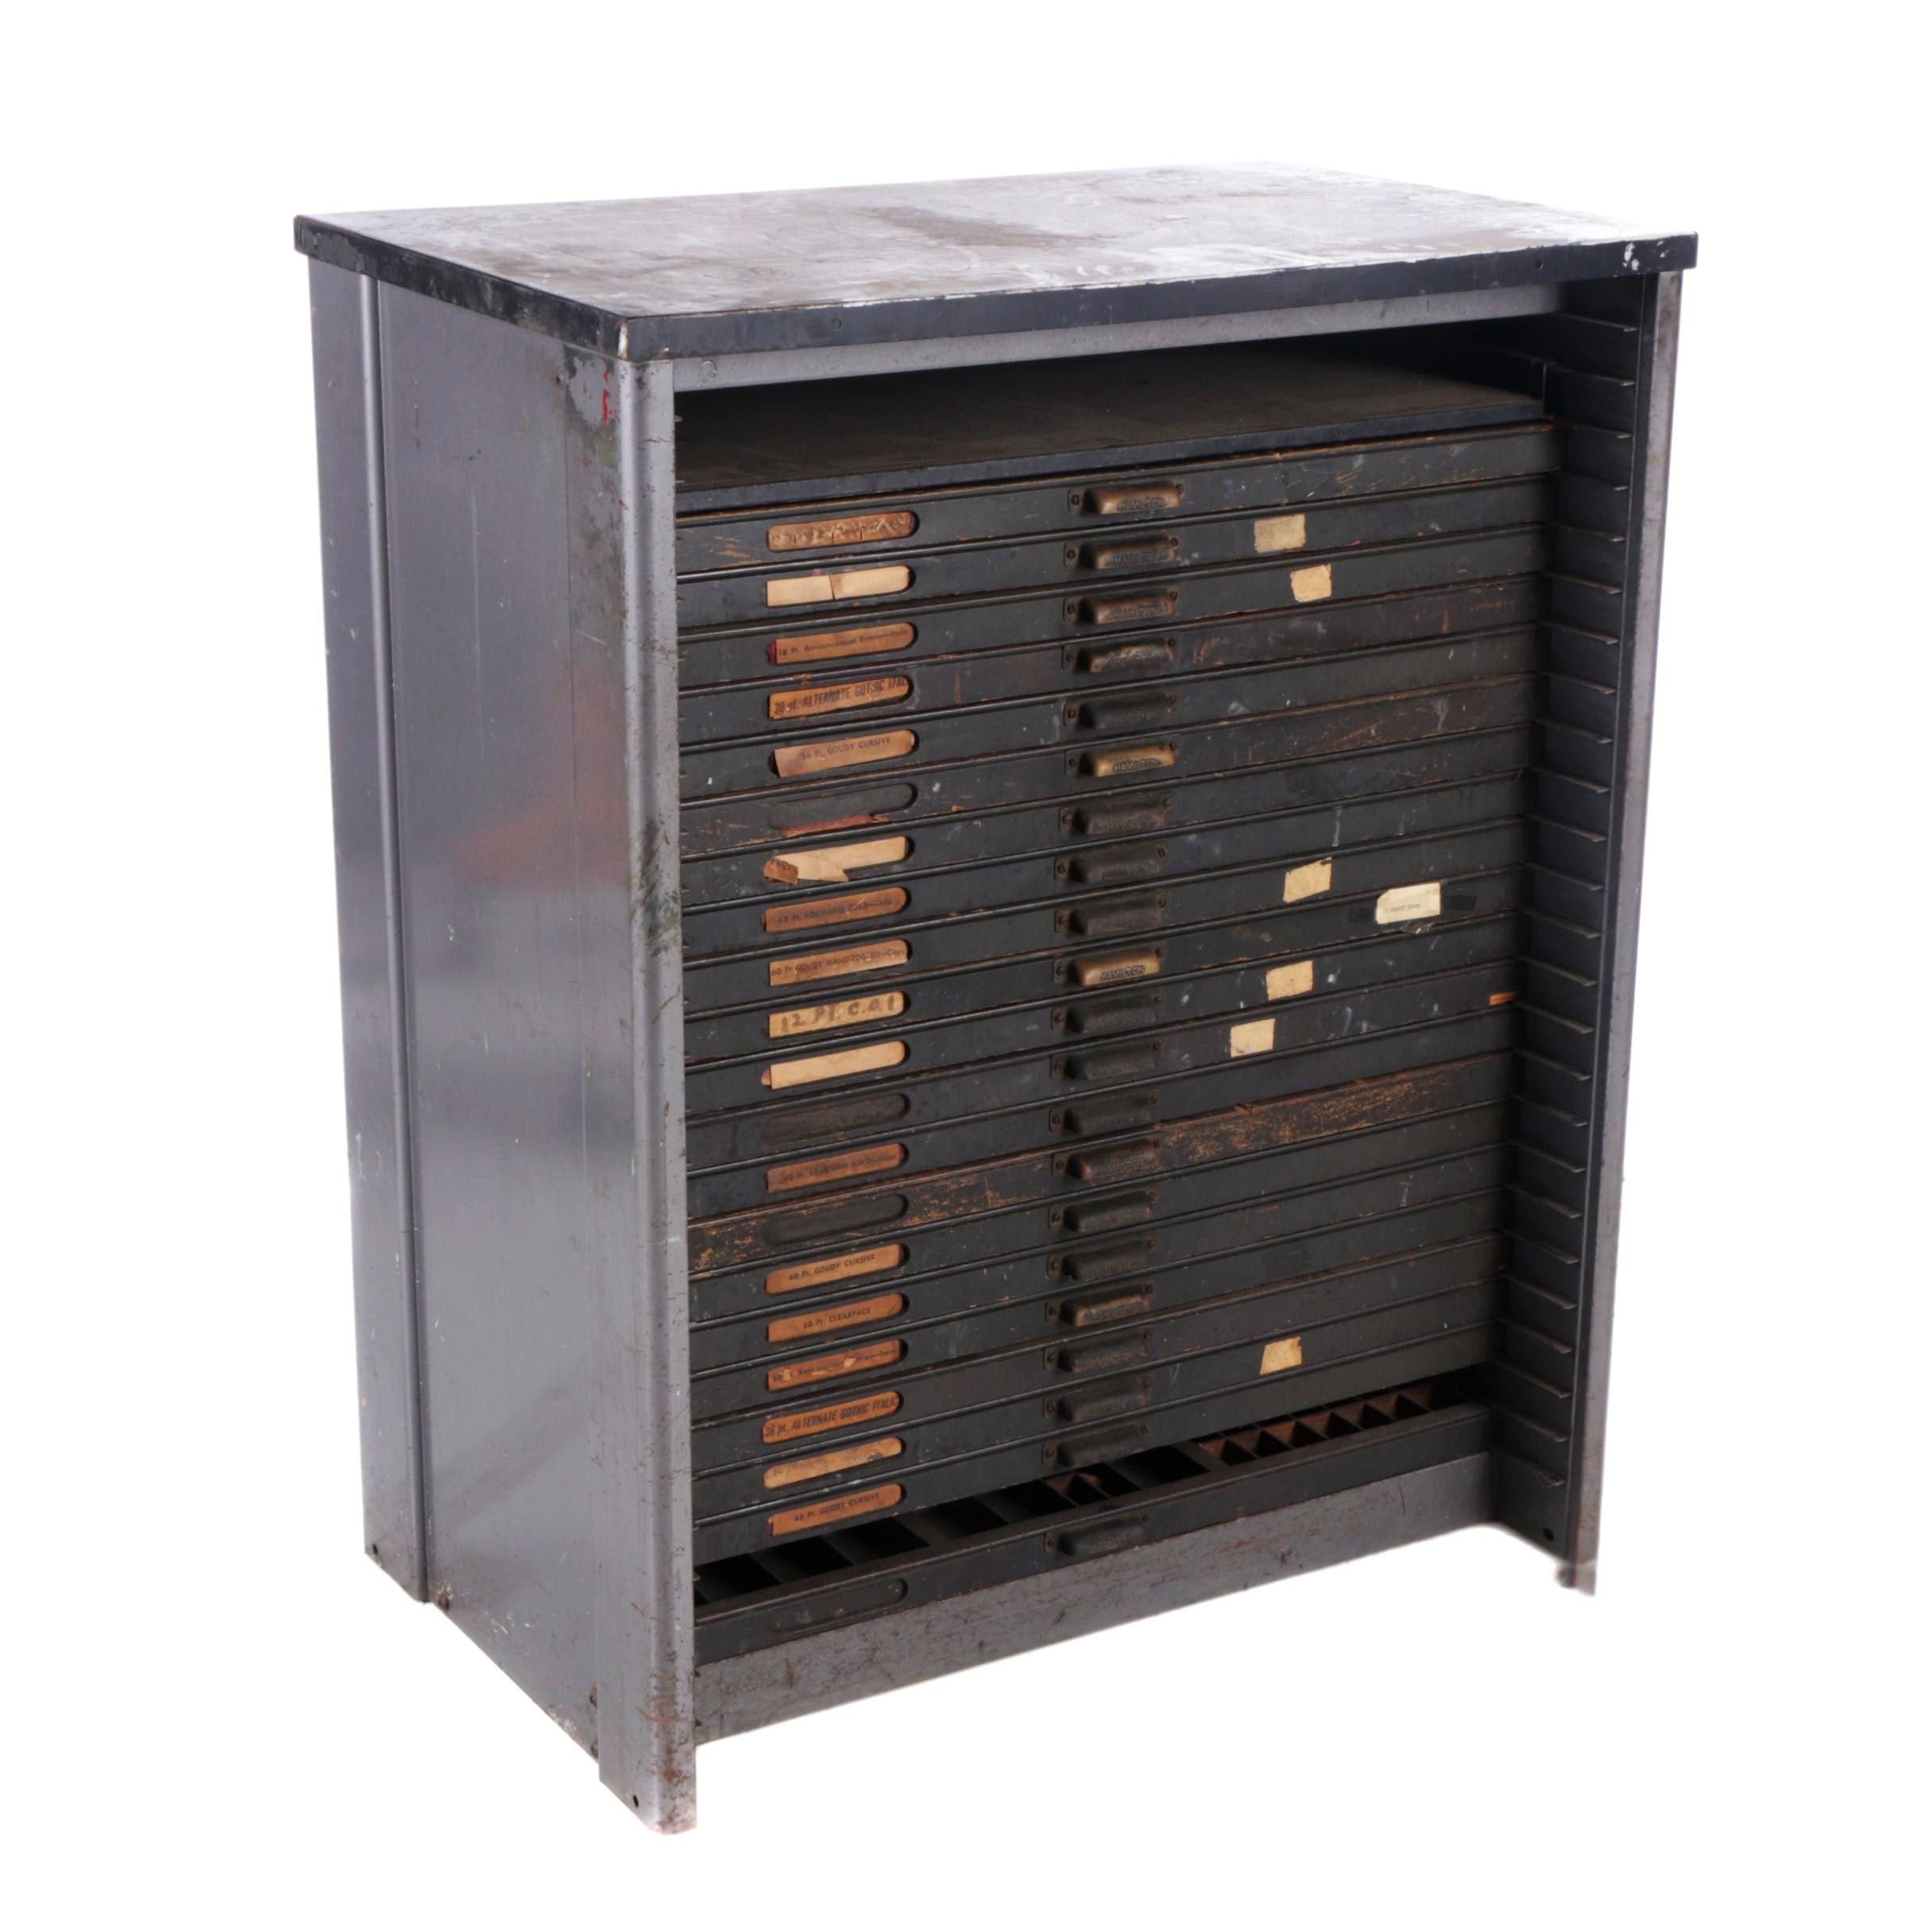 Vintage Metal Letterpress Storage Cabinet by Hamilton